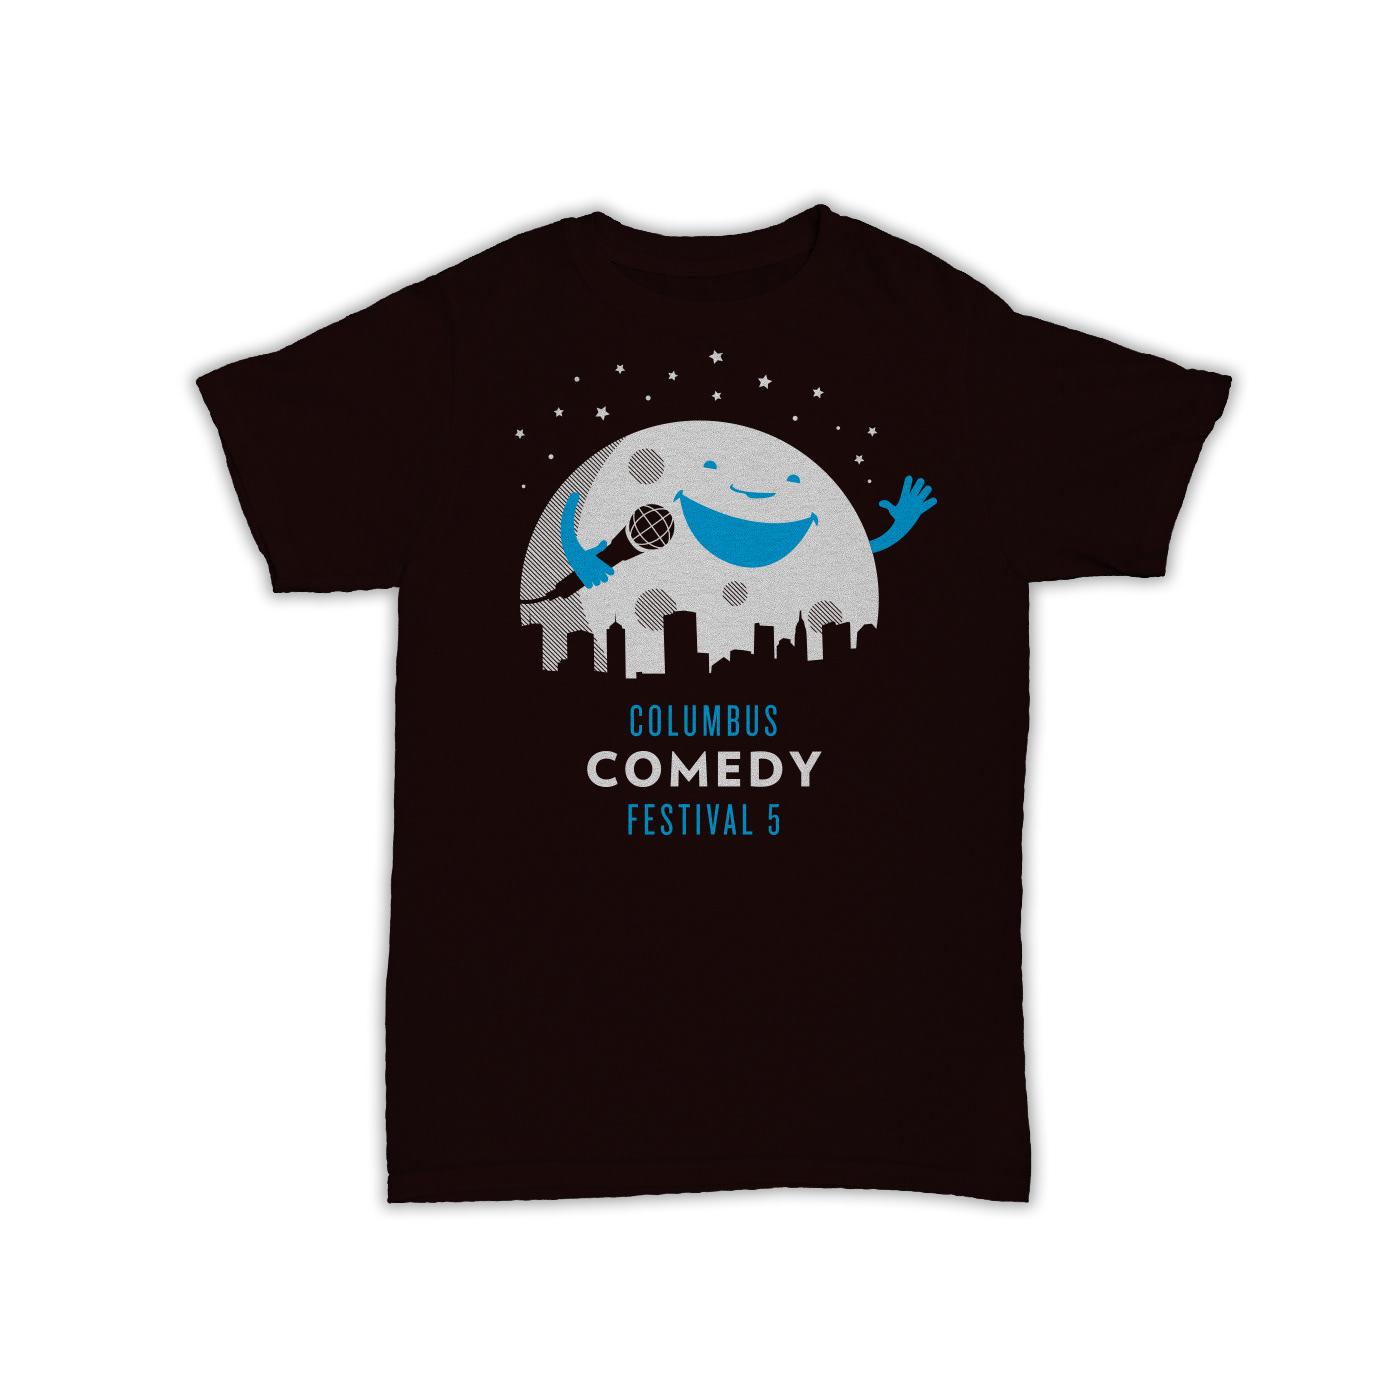 Laura Sanders T Shirts